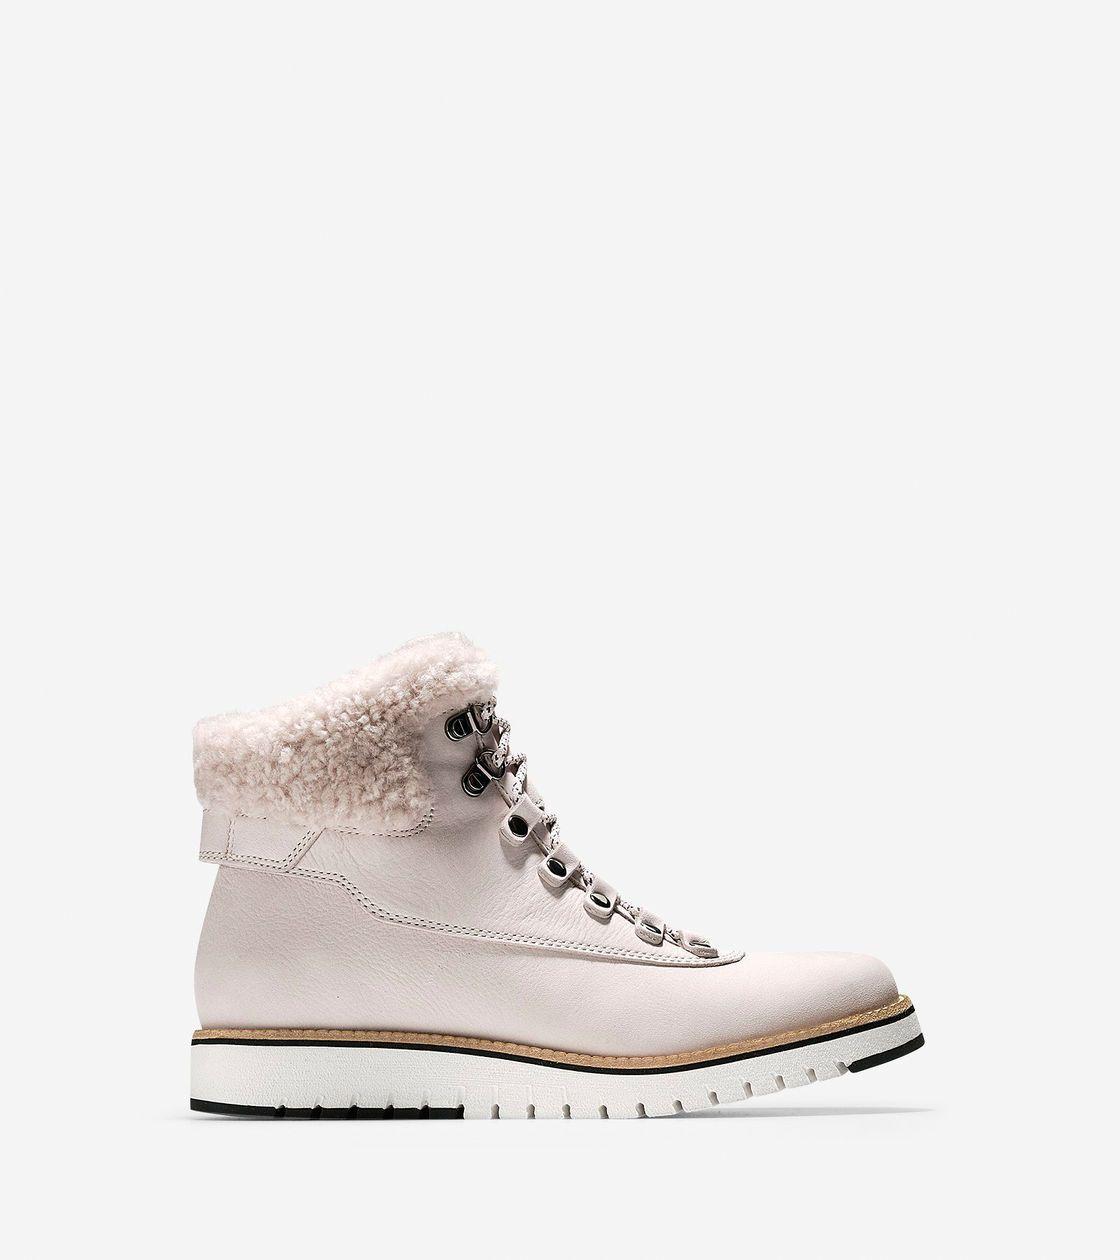 a43e39c6907 ZERØGRAND Explore Hiker Boot | shoes | Stylish winter boots, Cole ...